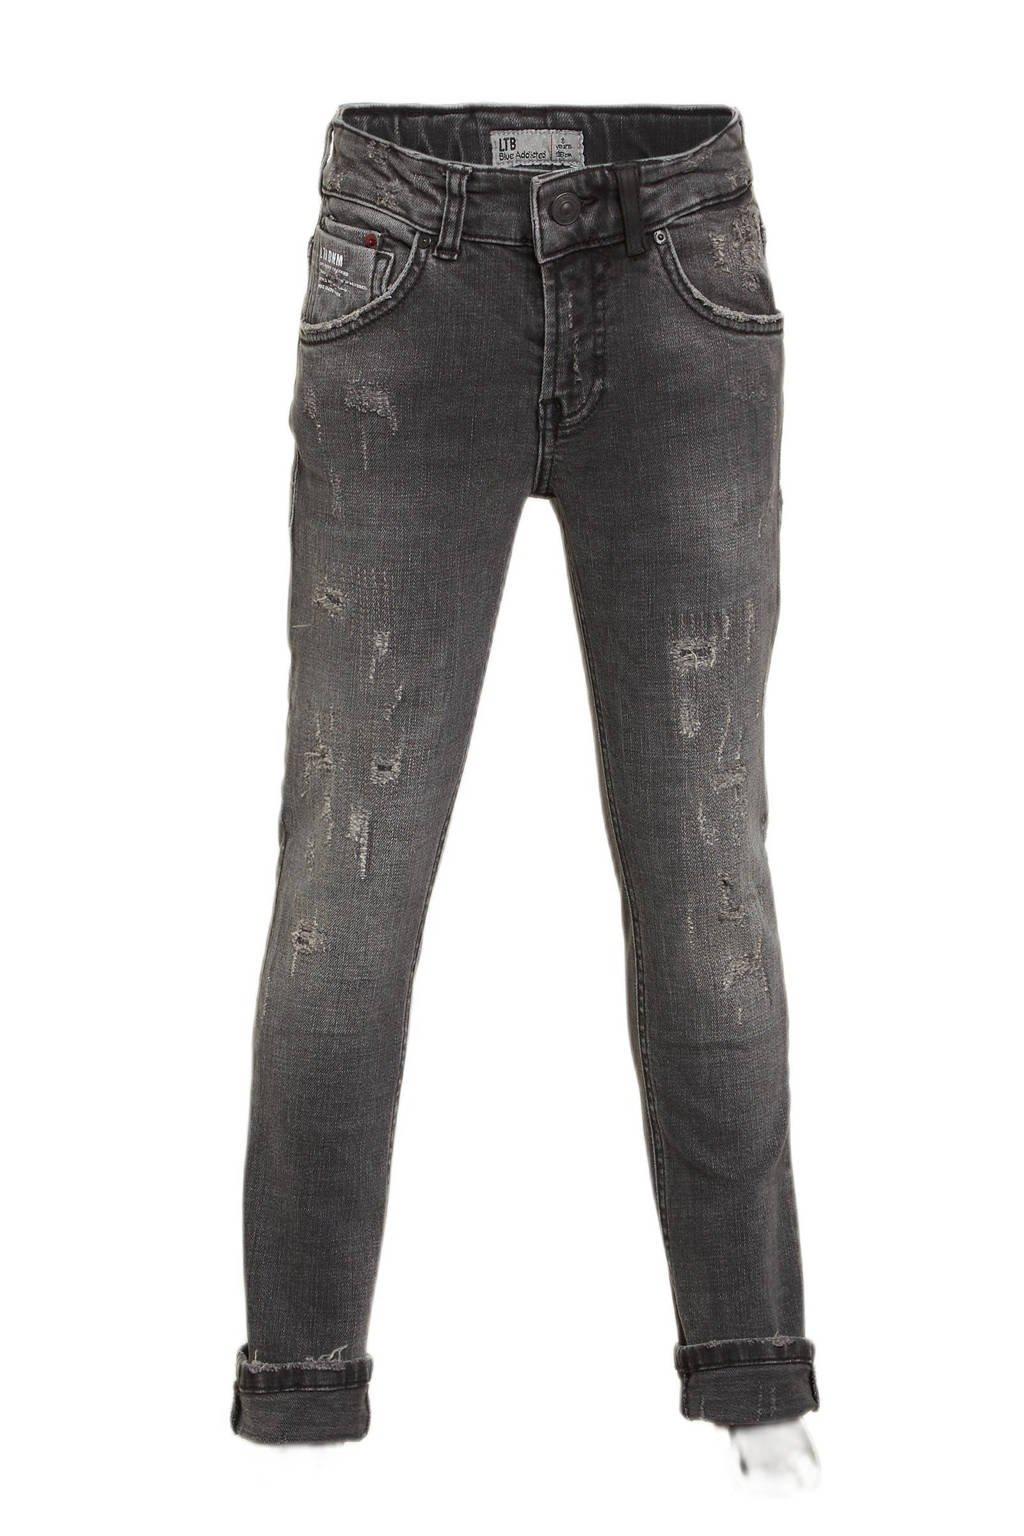 LTB slim fit jeans Smarty afon wash, Afon wash